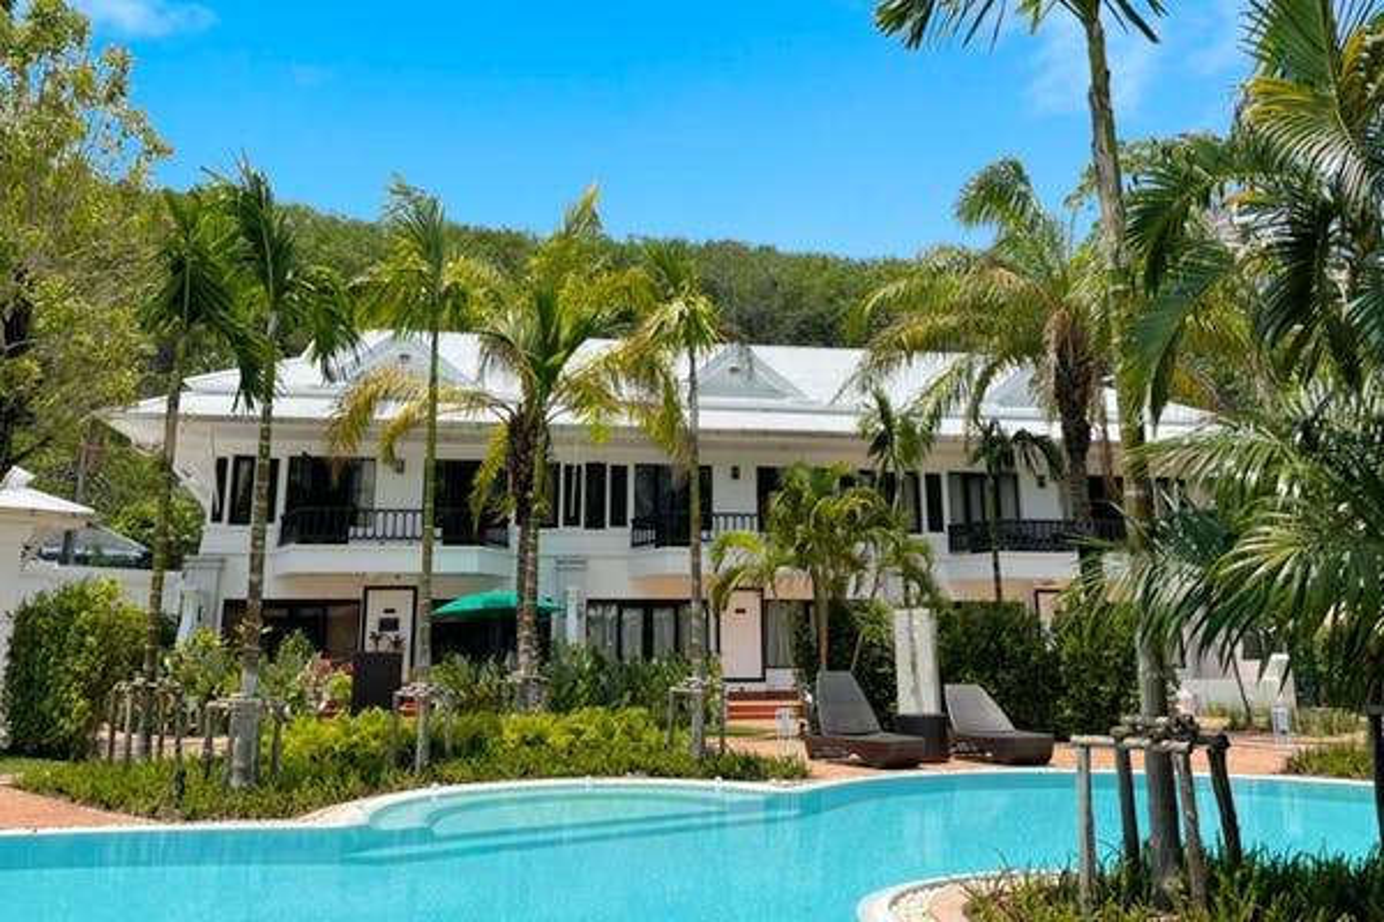 The Pe La Resort Phuket - Image 5